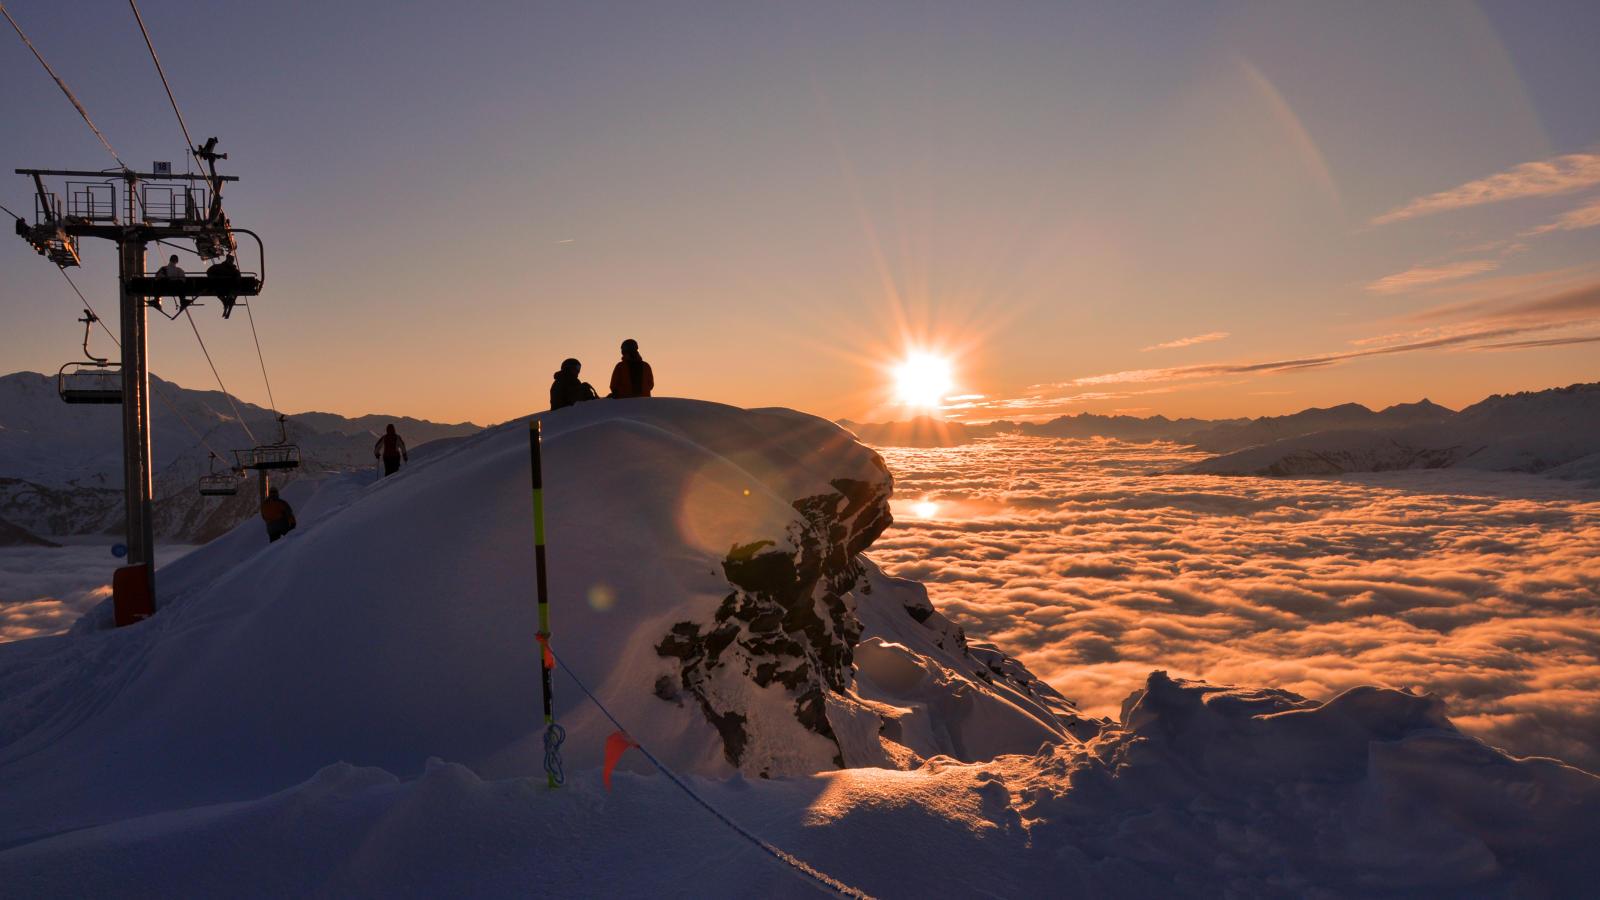 http://res.cloudinary.com/holiday-images/image/upload/q_75,w_1600,h_900,c_fill,fl_keep_iptc/v1373553384/france/la_rosiere/images/resort_la_rosiere_8.jpg